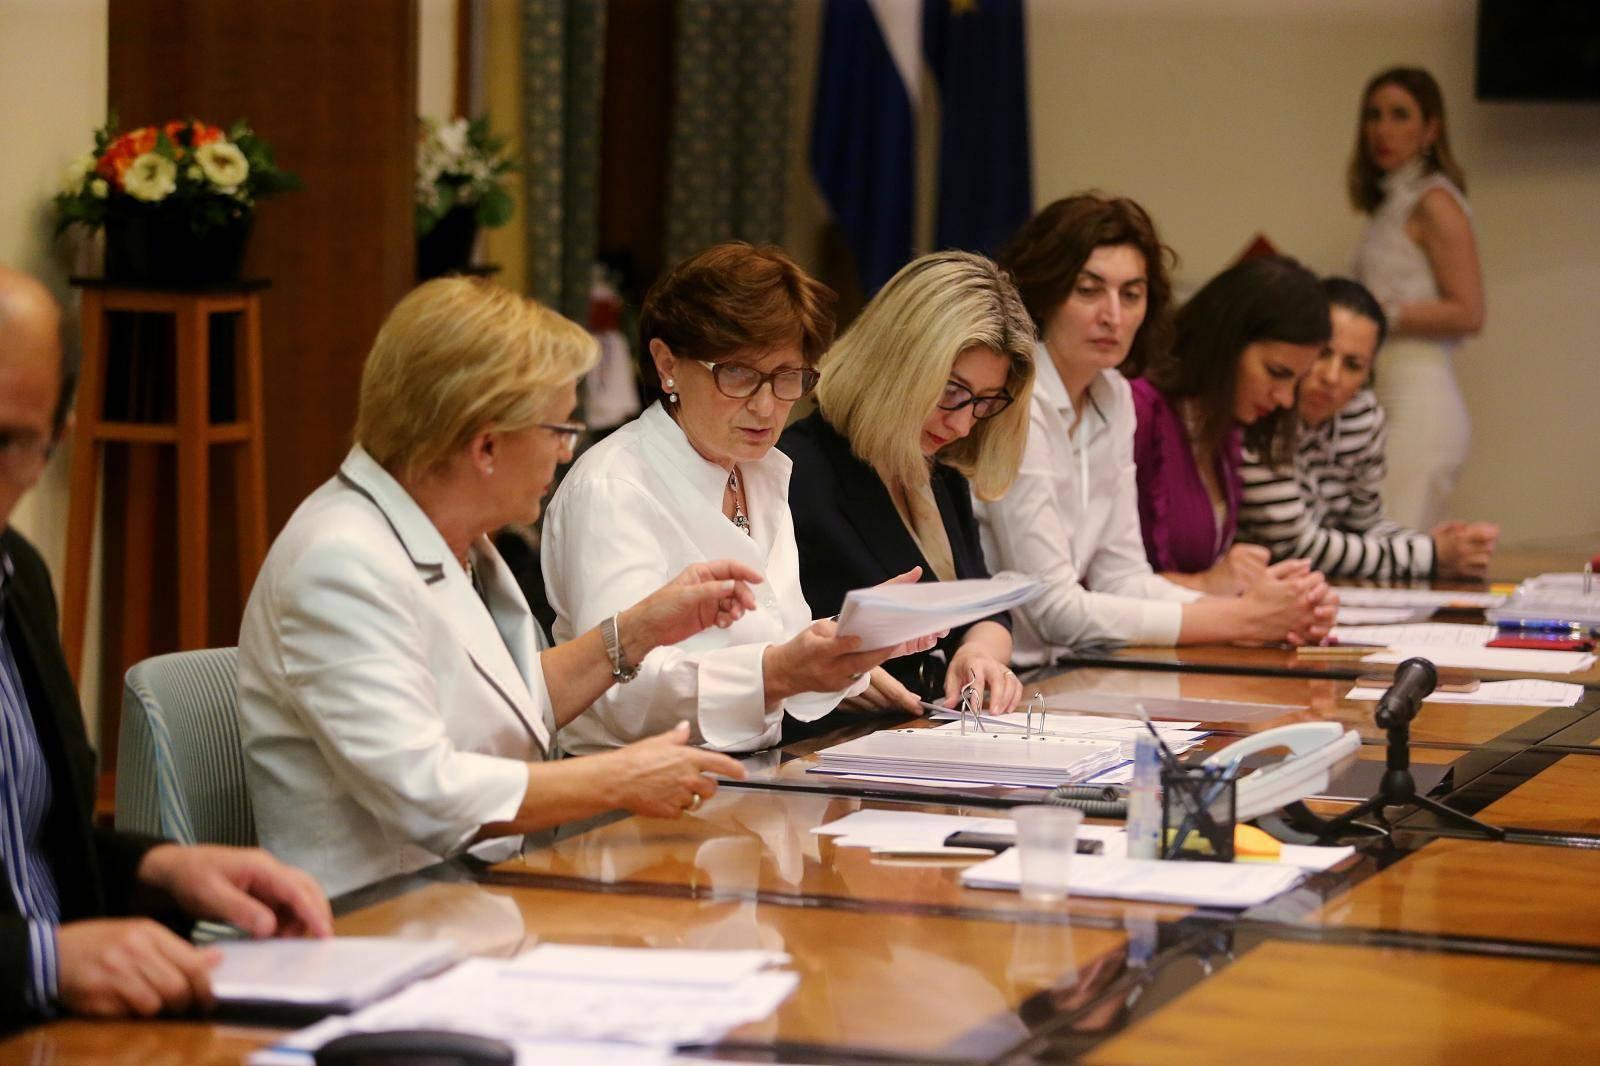 Zagreb: Stranka s imenom i prezimenom, Pametno i Fokus predale kandidacijske liste